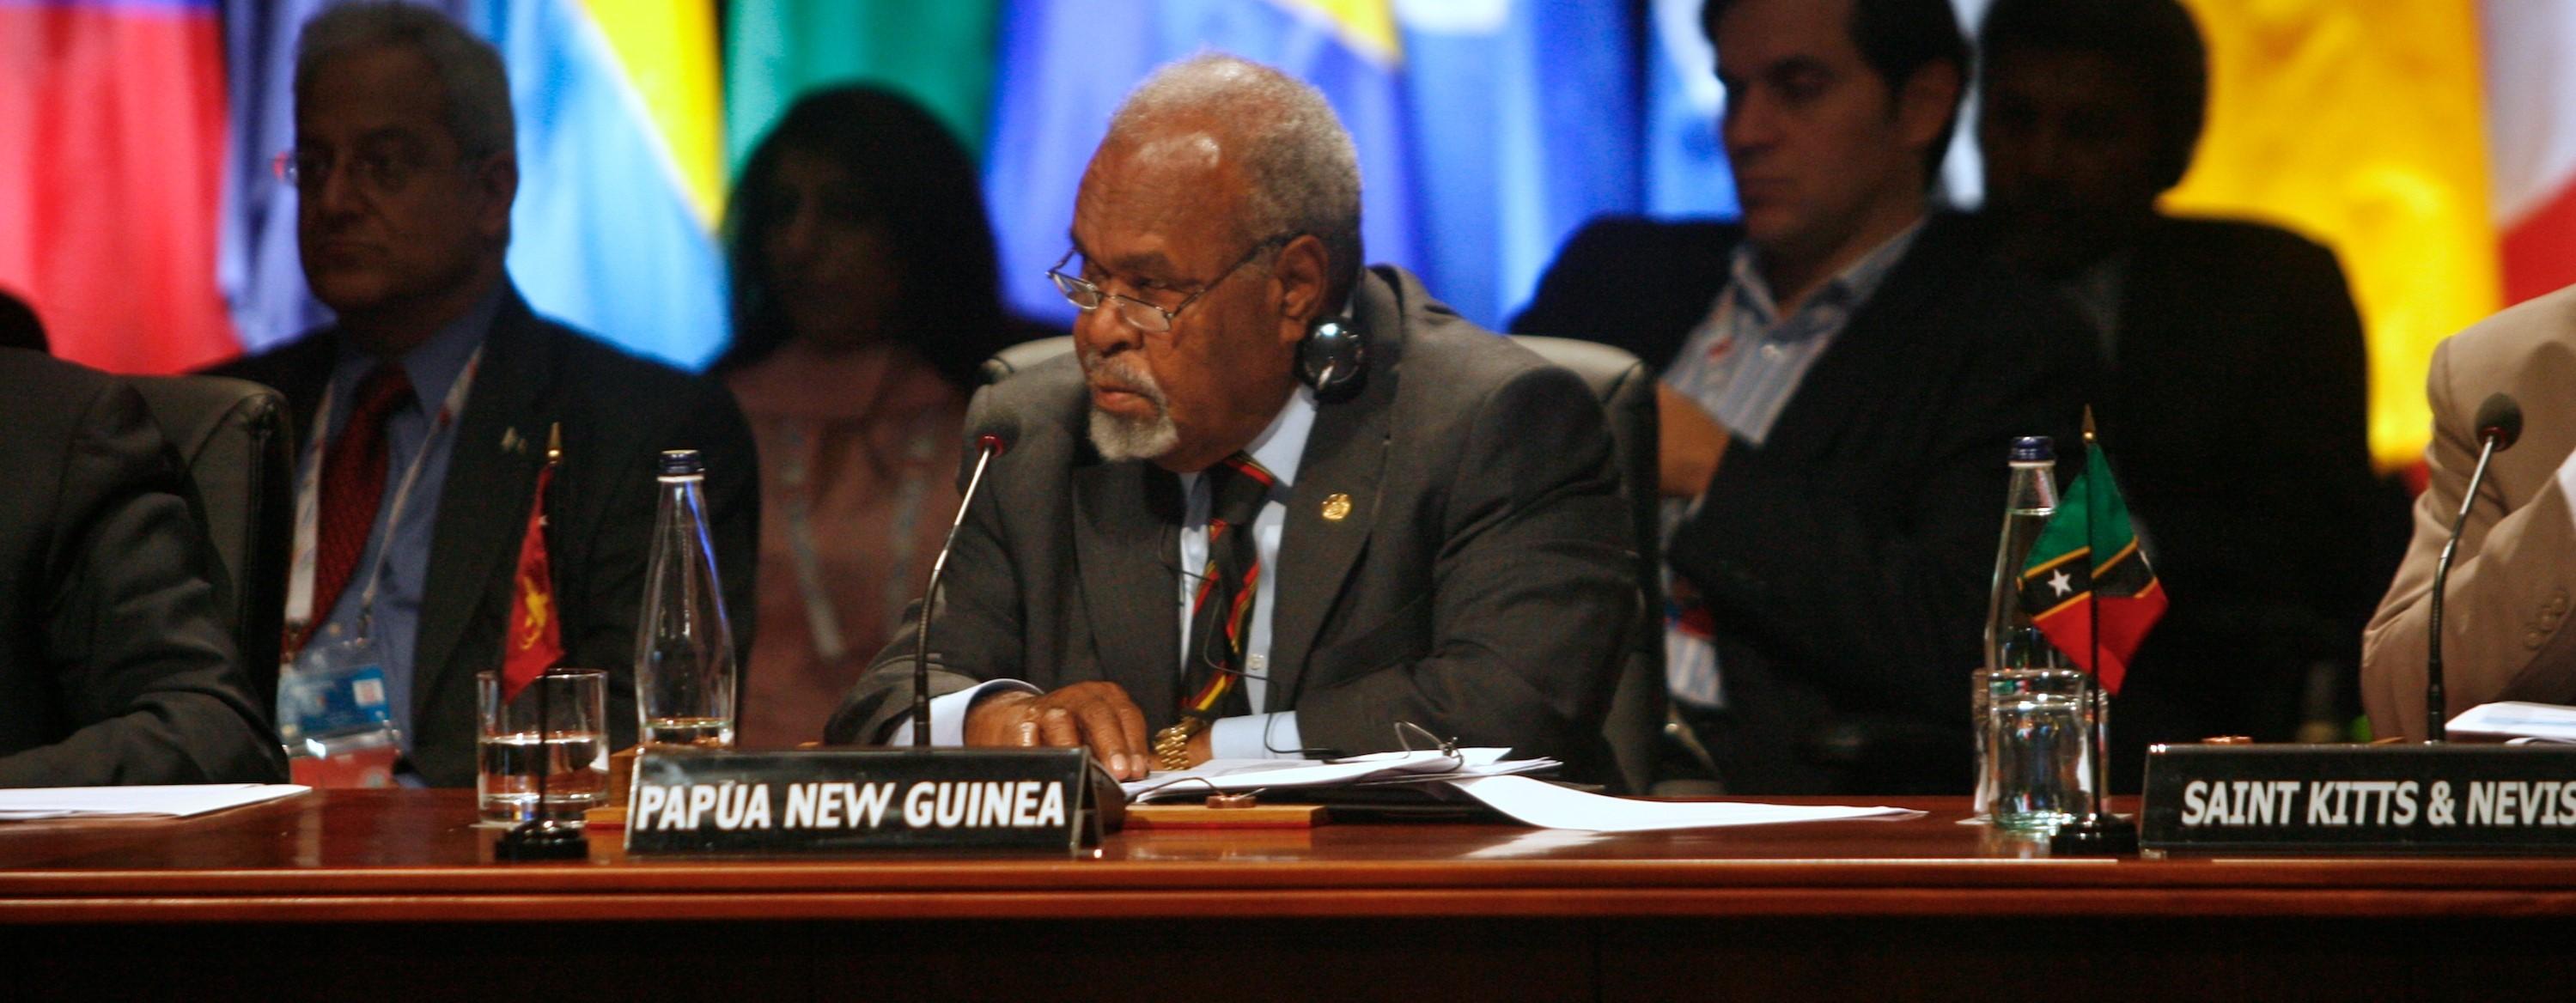 Sir Michael Somare (Photo: Flickr/Commonwealth Secretariat)